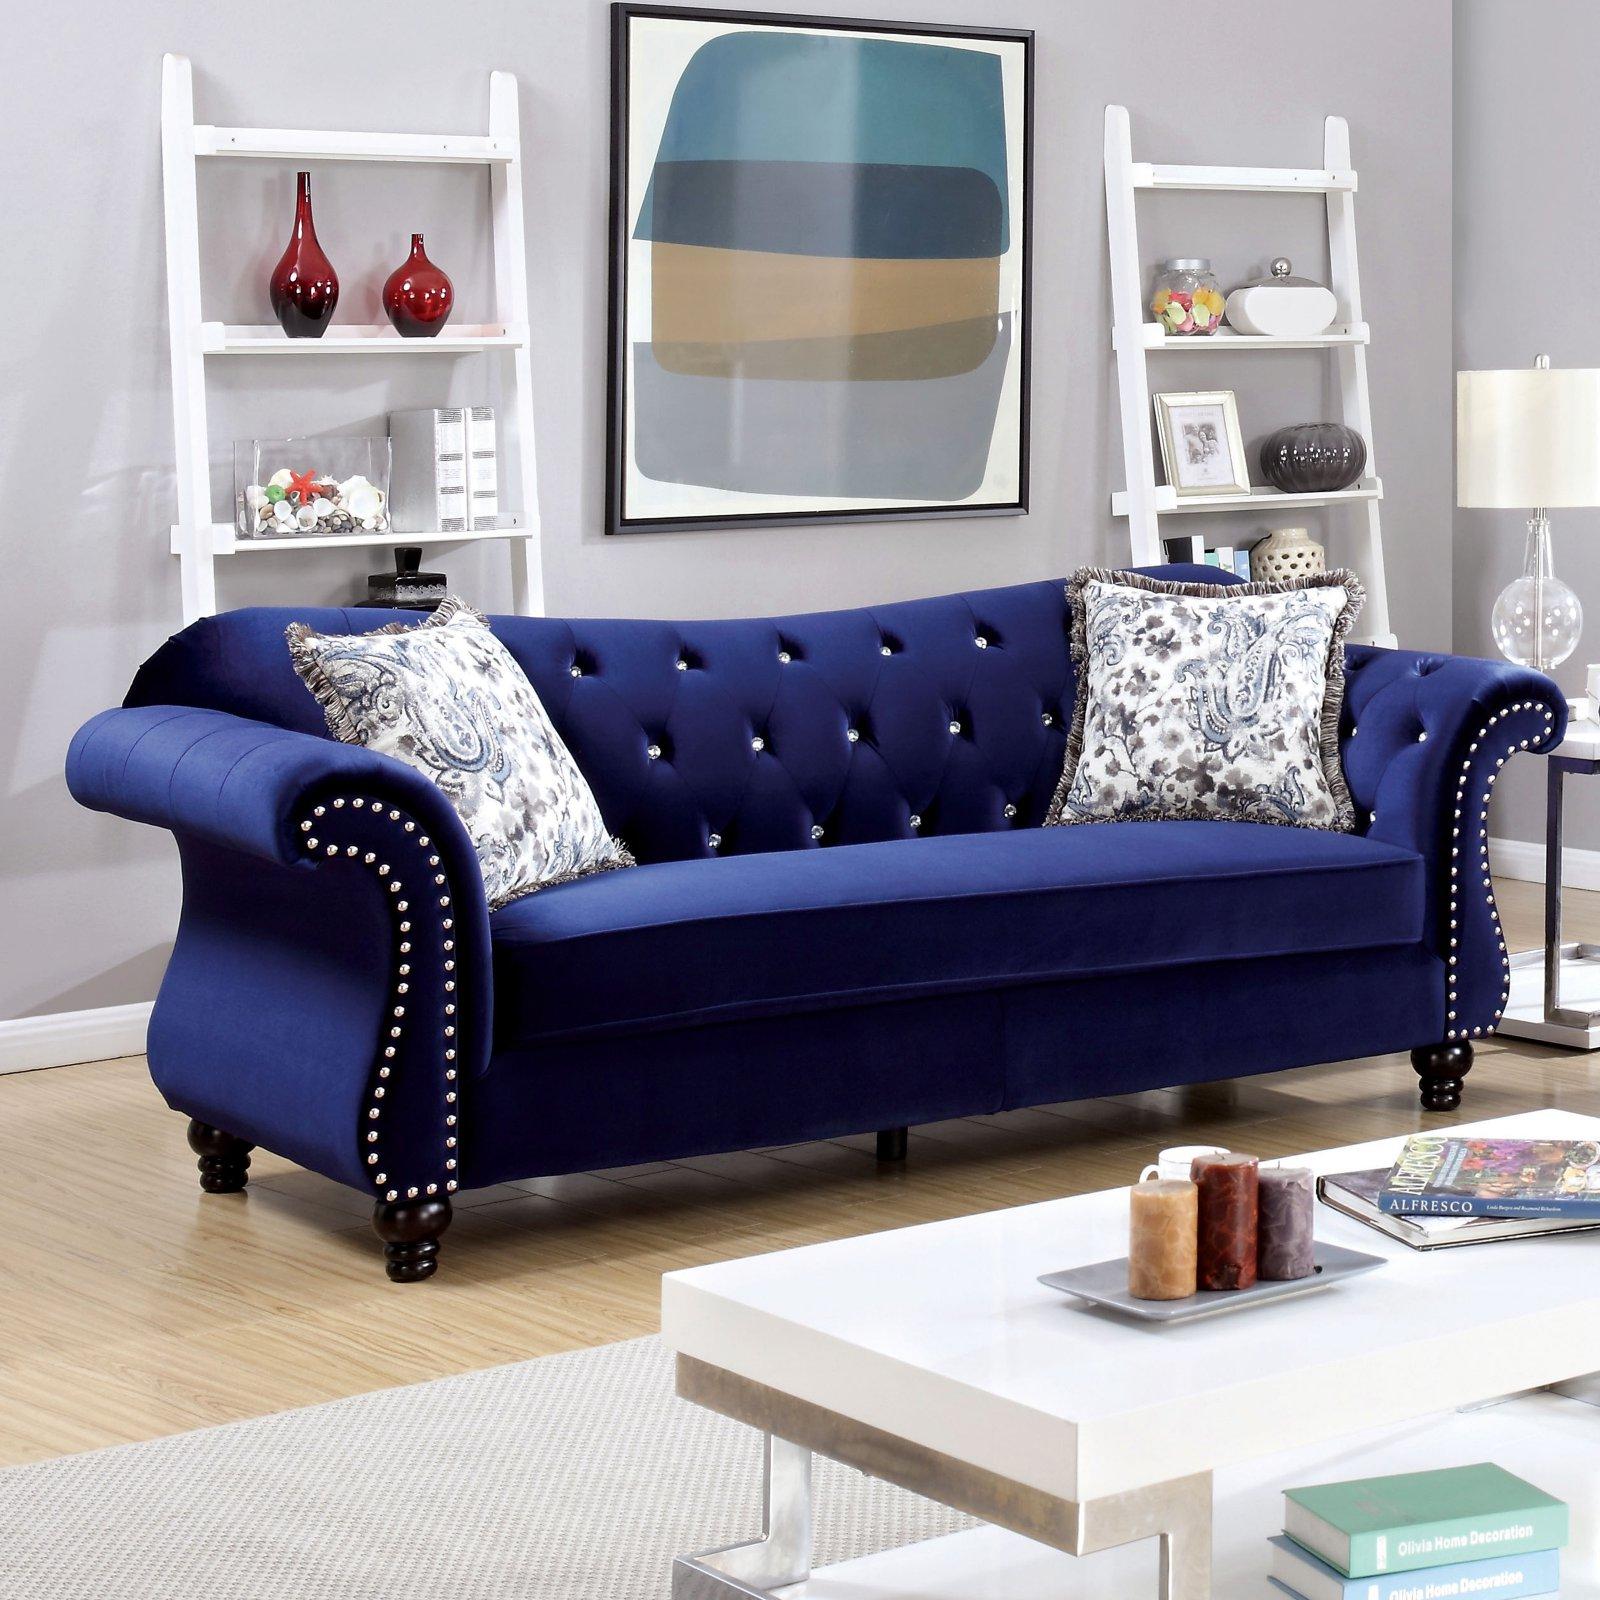 Furniture of America Ileyna Sofa